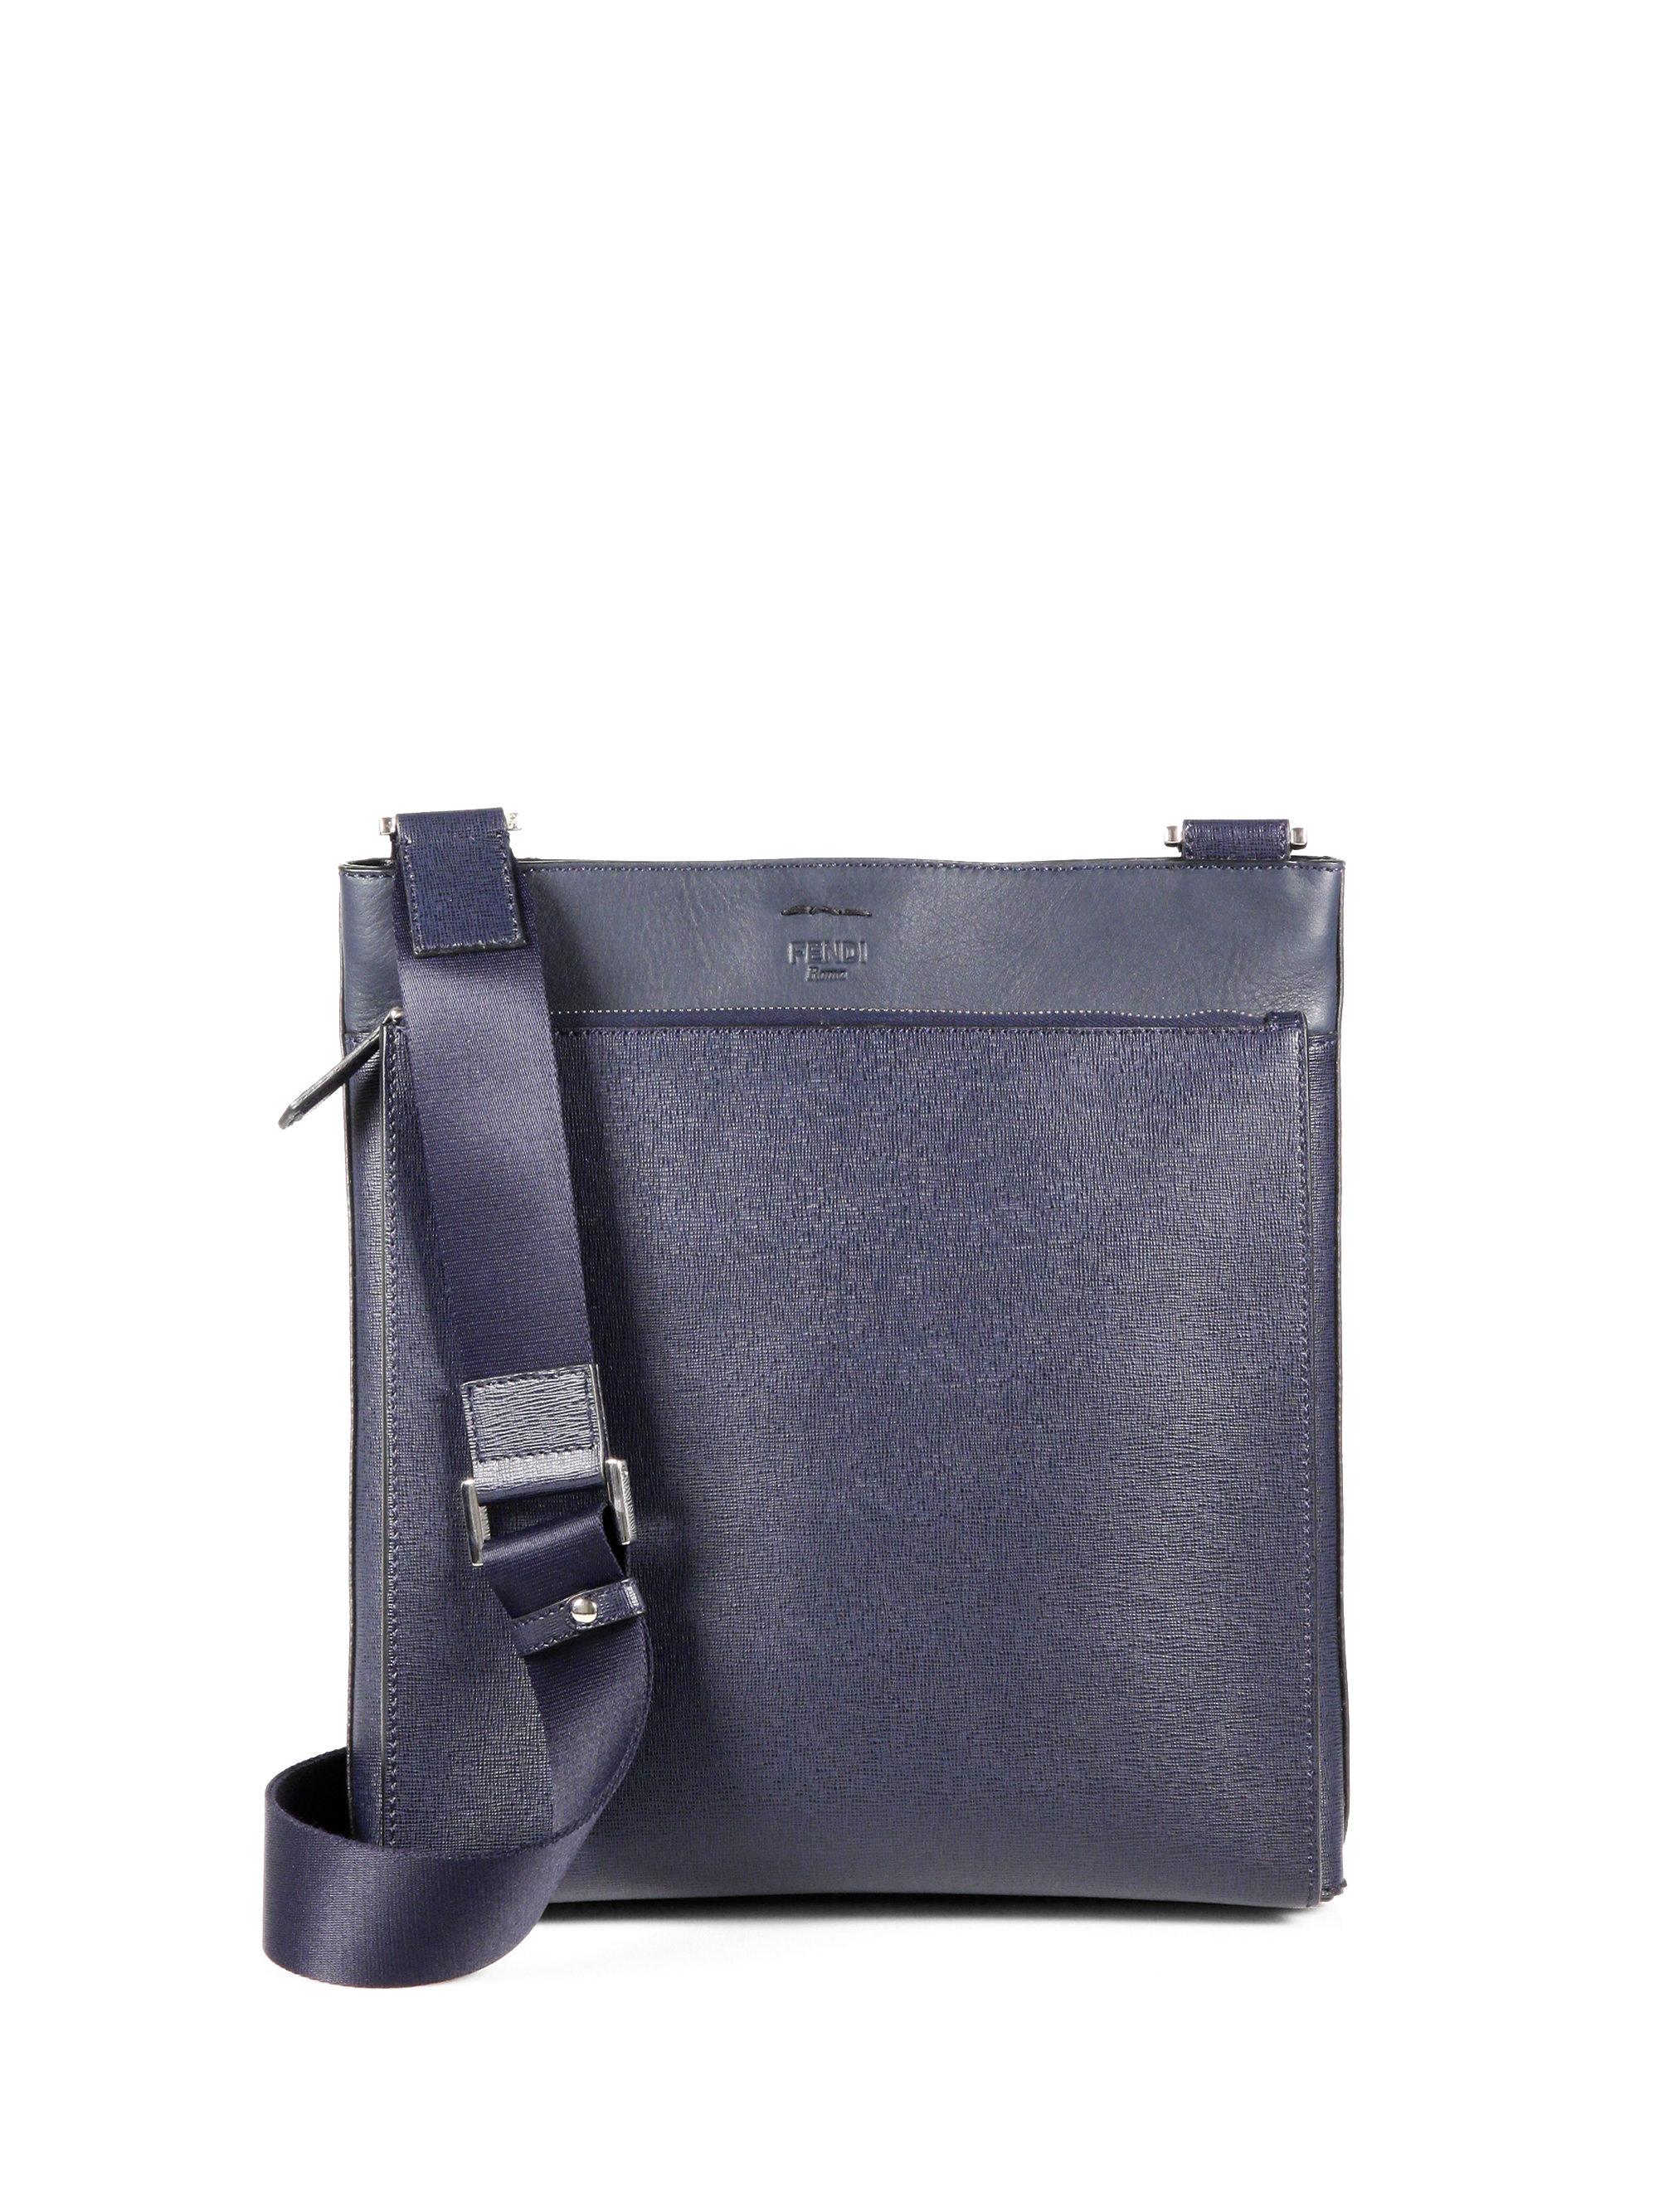 83cce3436d Lyst - Fendi Flat Crossbody Bag in Blue for Men